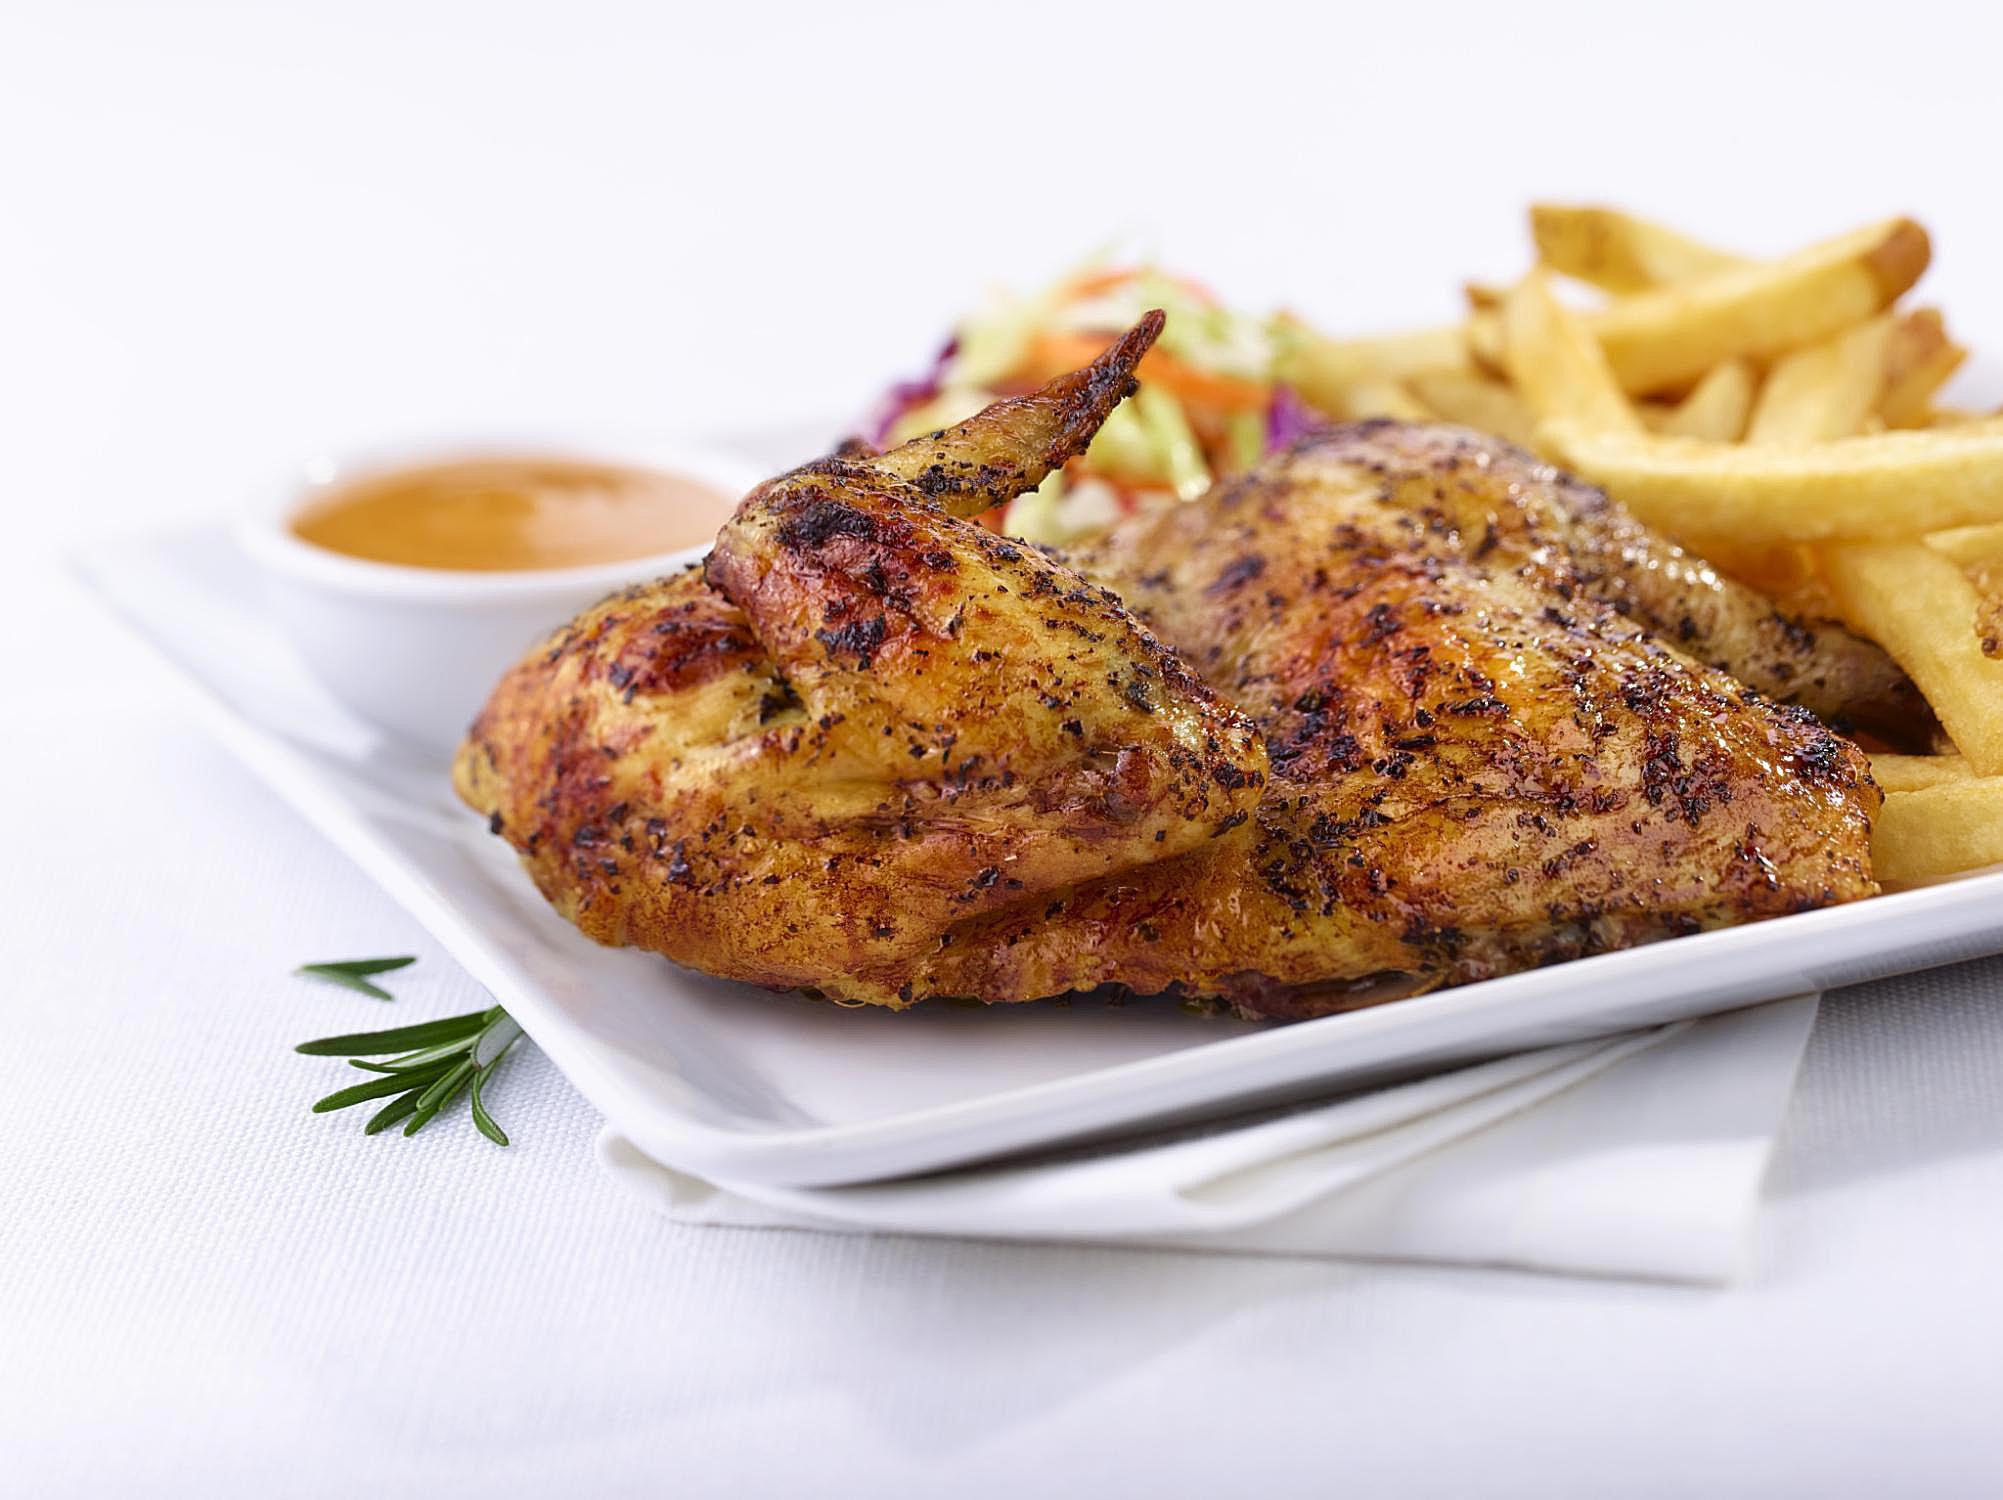 Australian main dish recipes top 10 favorite australian chicken dinner recipes forumfinder Images